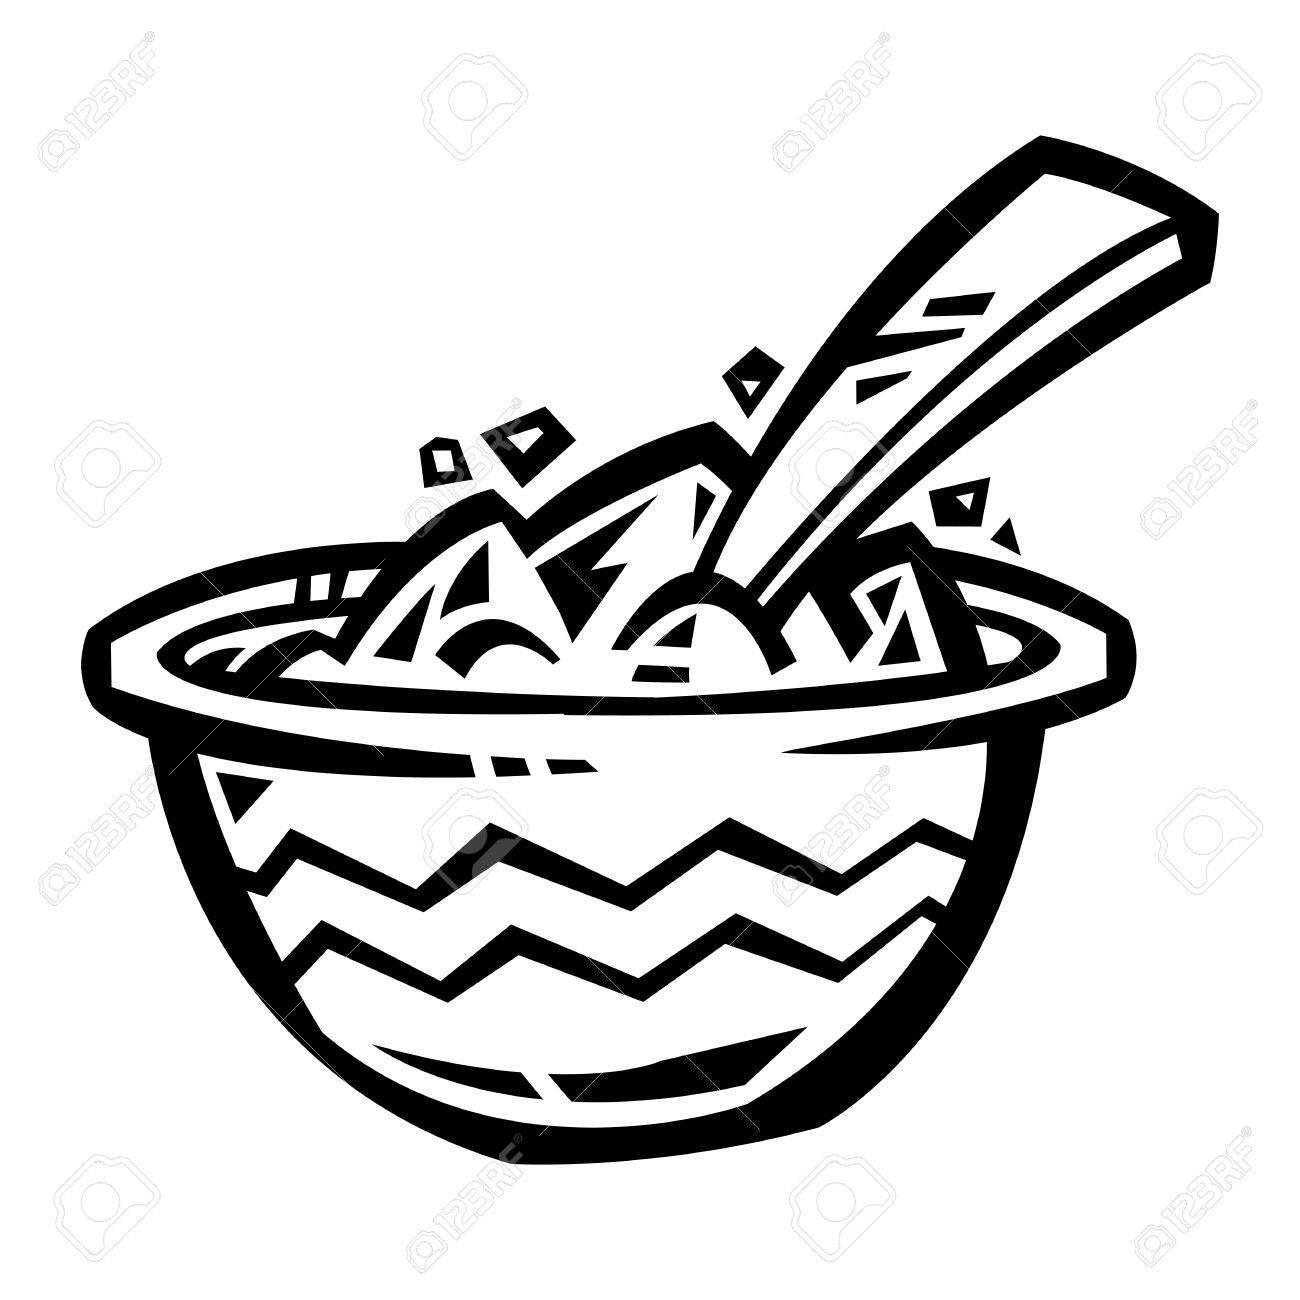 mixing bowl drawing at getdrawings com free for personal use rh getdrawings com  mixing bowl clipart black and white